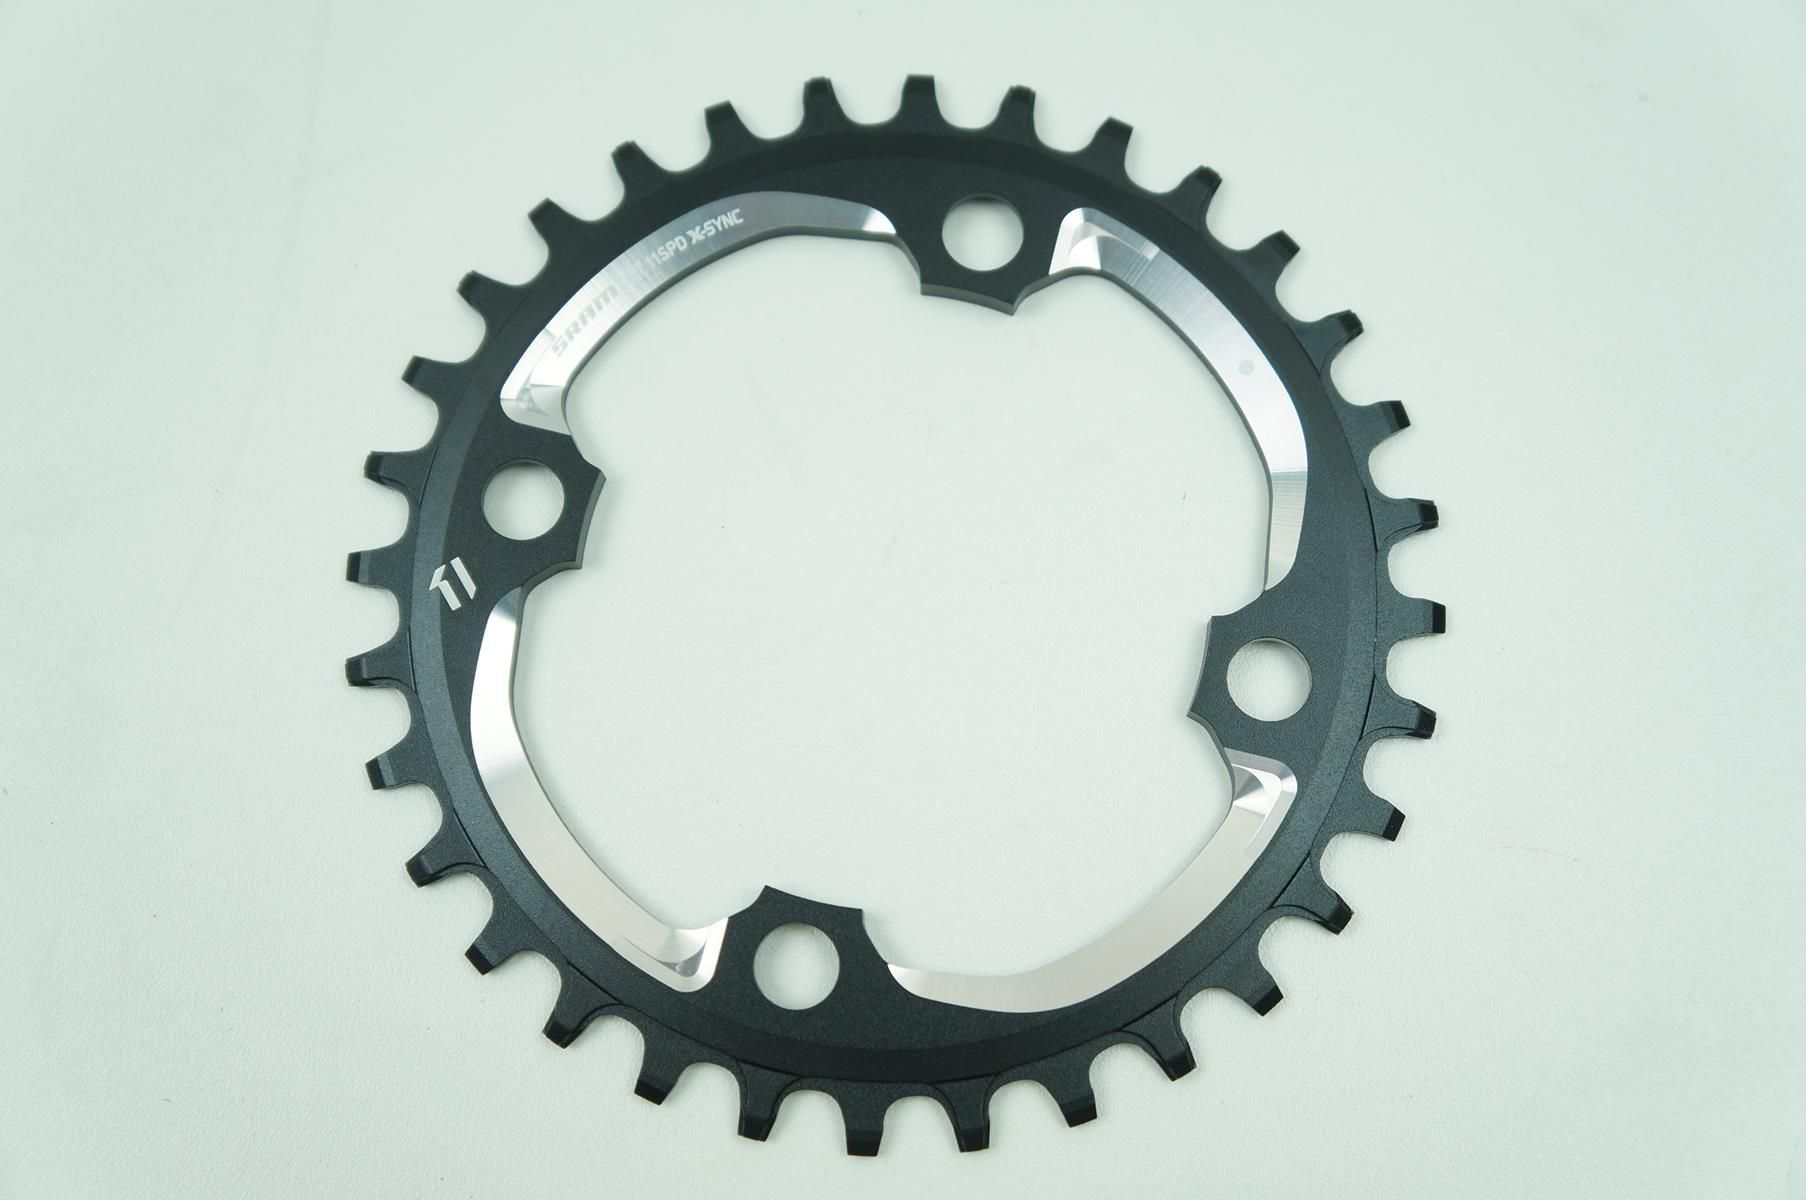 Coroa Bicicleta Sram 32 dentes BCD 94mm X-sync Para Uso 11v Narrow Wide